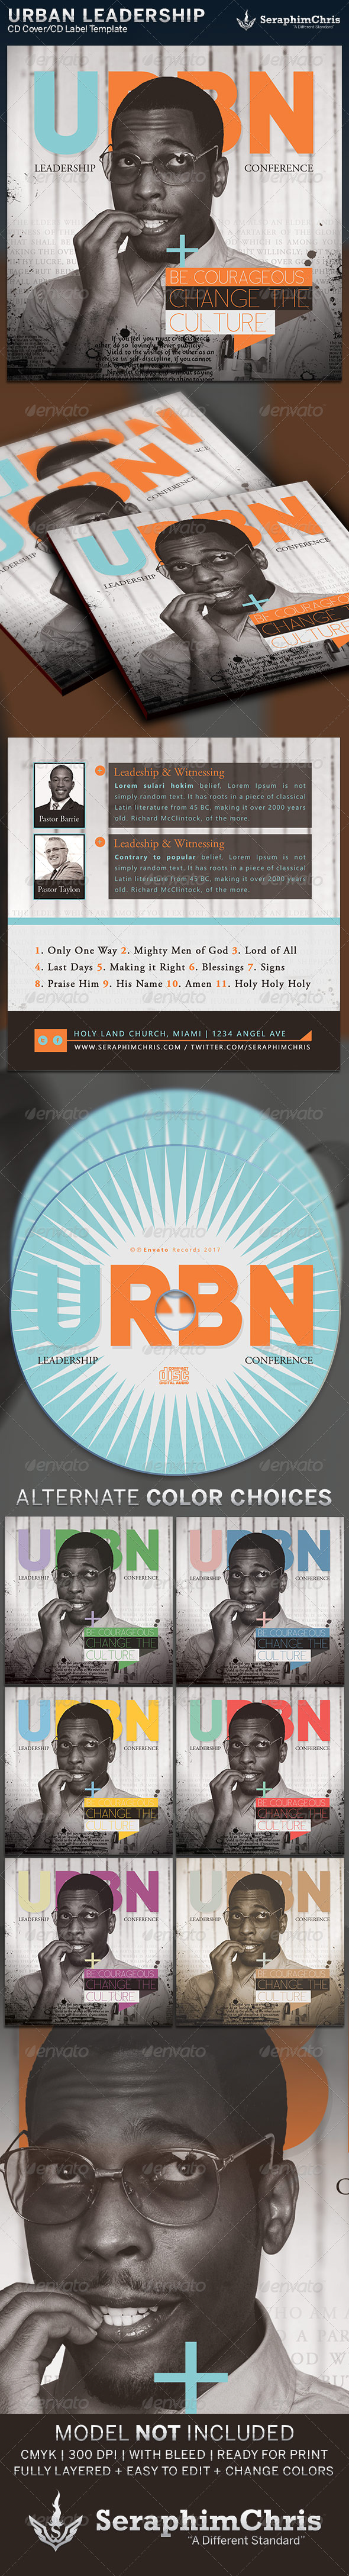 Urban Leadership: CD Cover Artwork Template - CD & DVD Artwork Print Templates